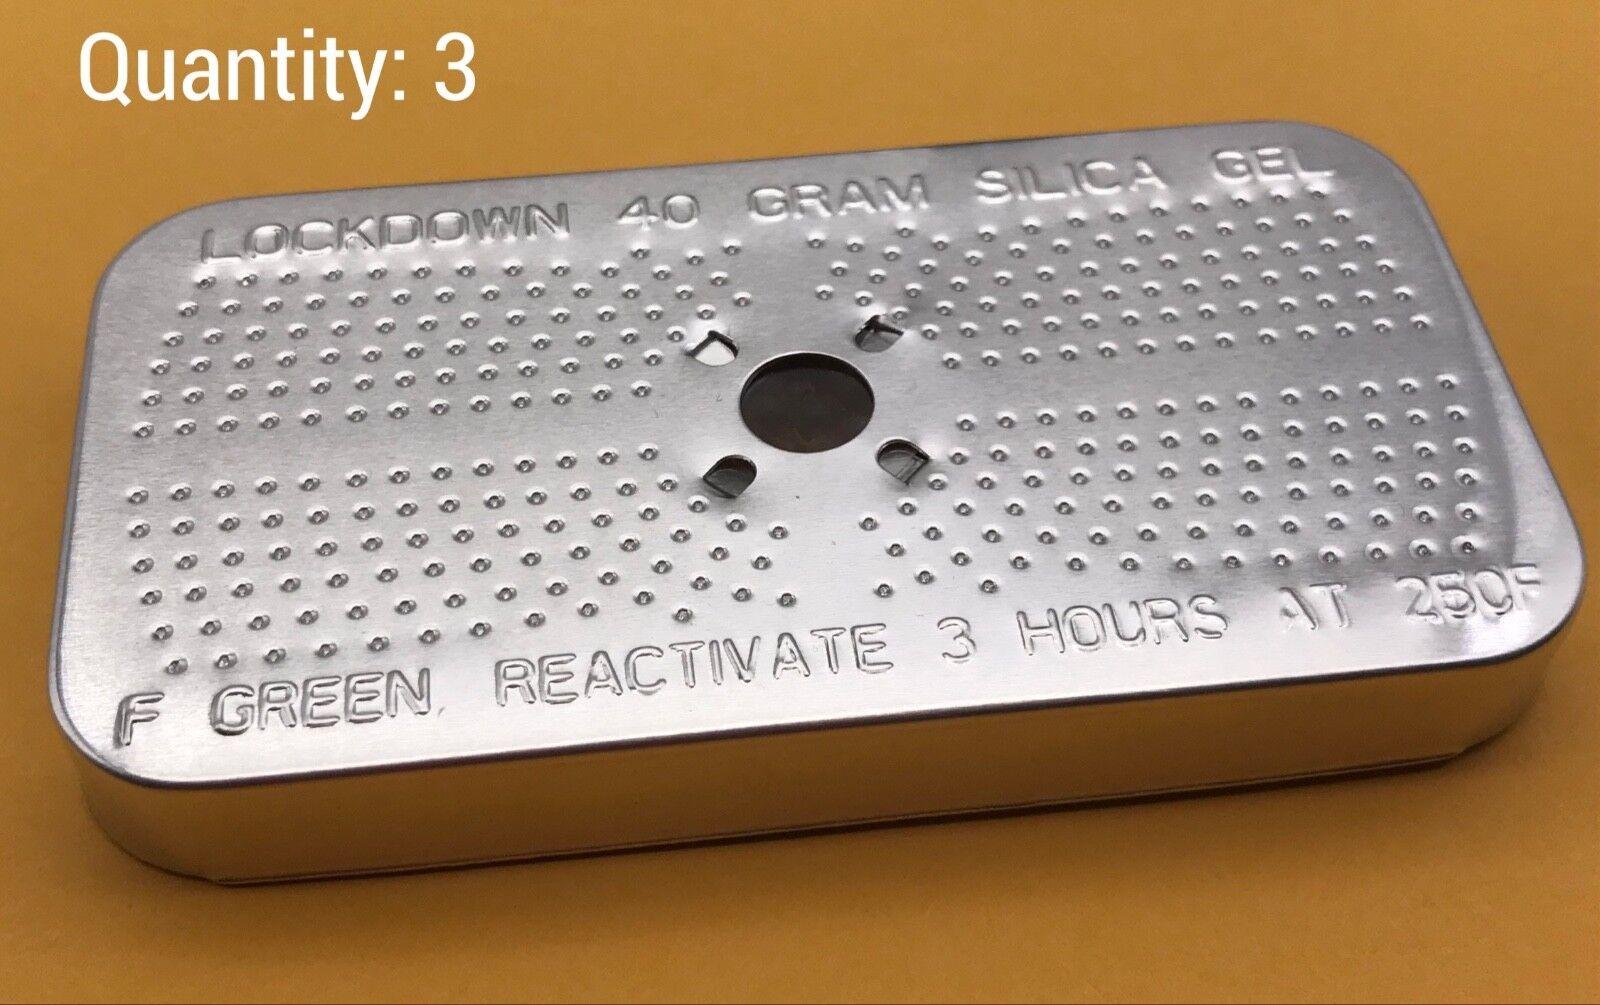 3 Rechargeable 40 Gram Desiccant Gun Safe Ammo Dehumidifier